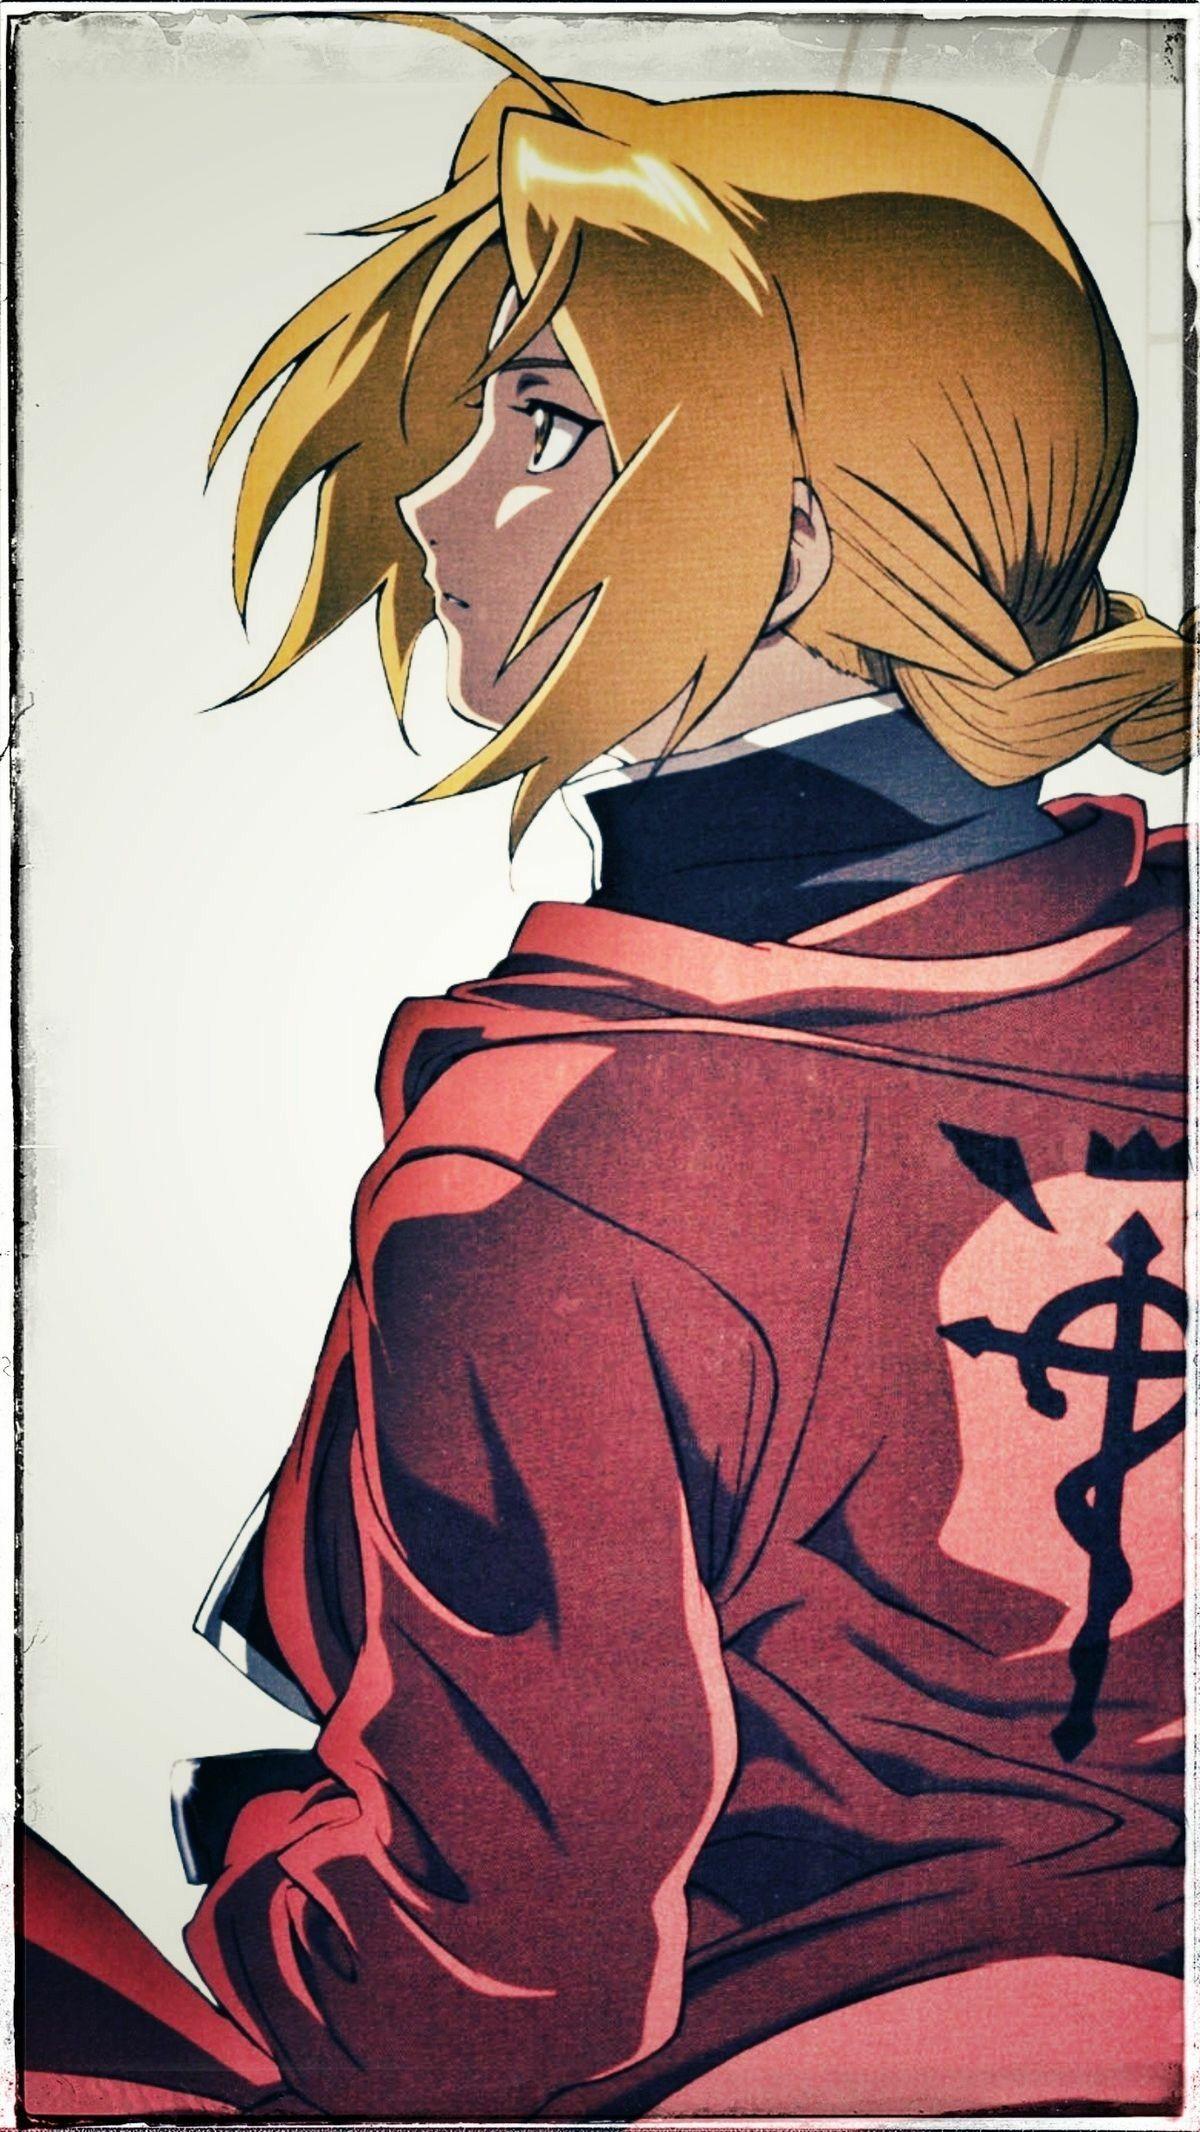 Watch Fullmetal Alchemist Episodes on www.animeuniverse